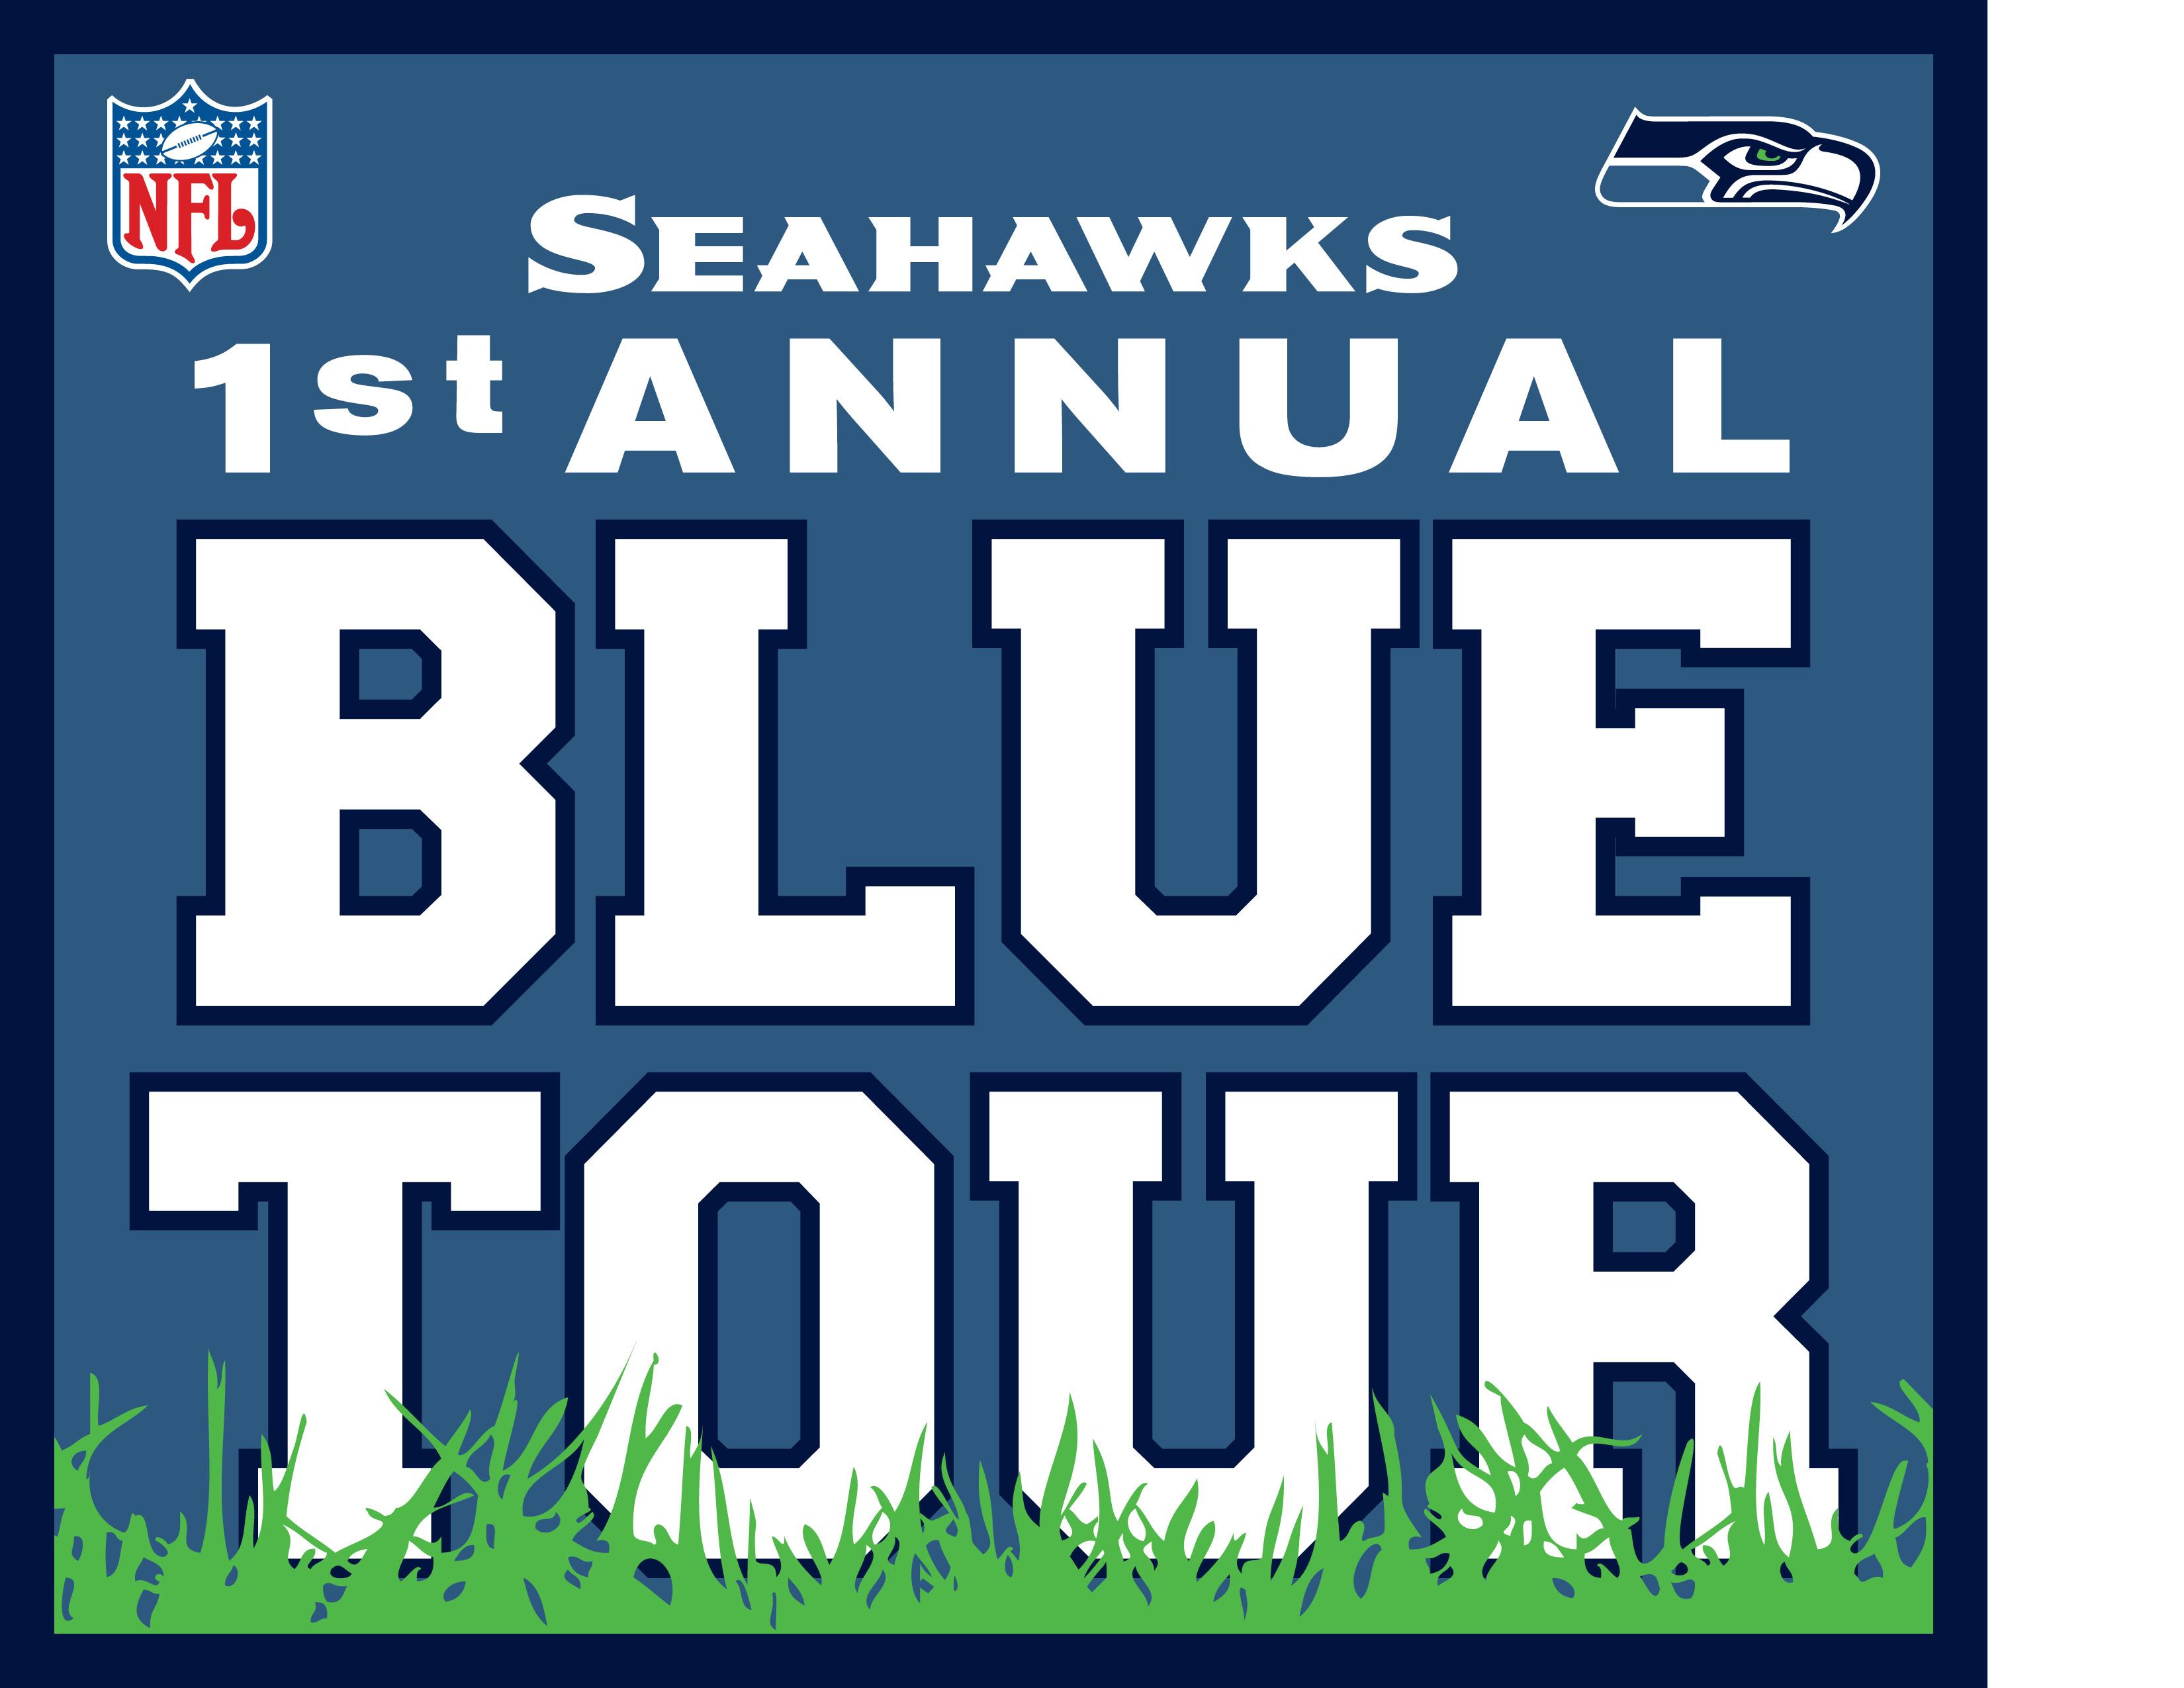 Seahawks Blue Tour logo